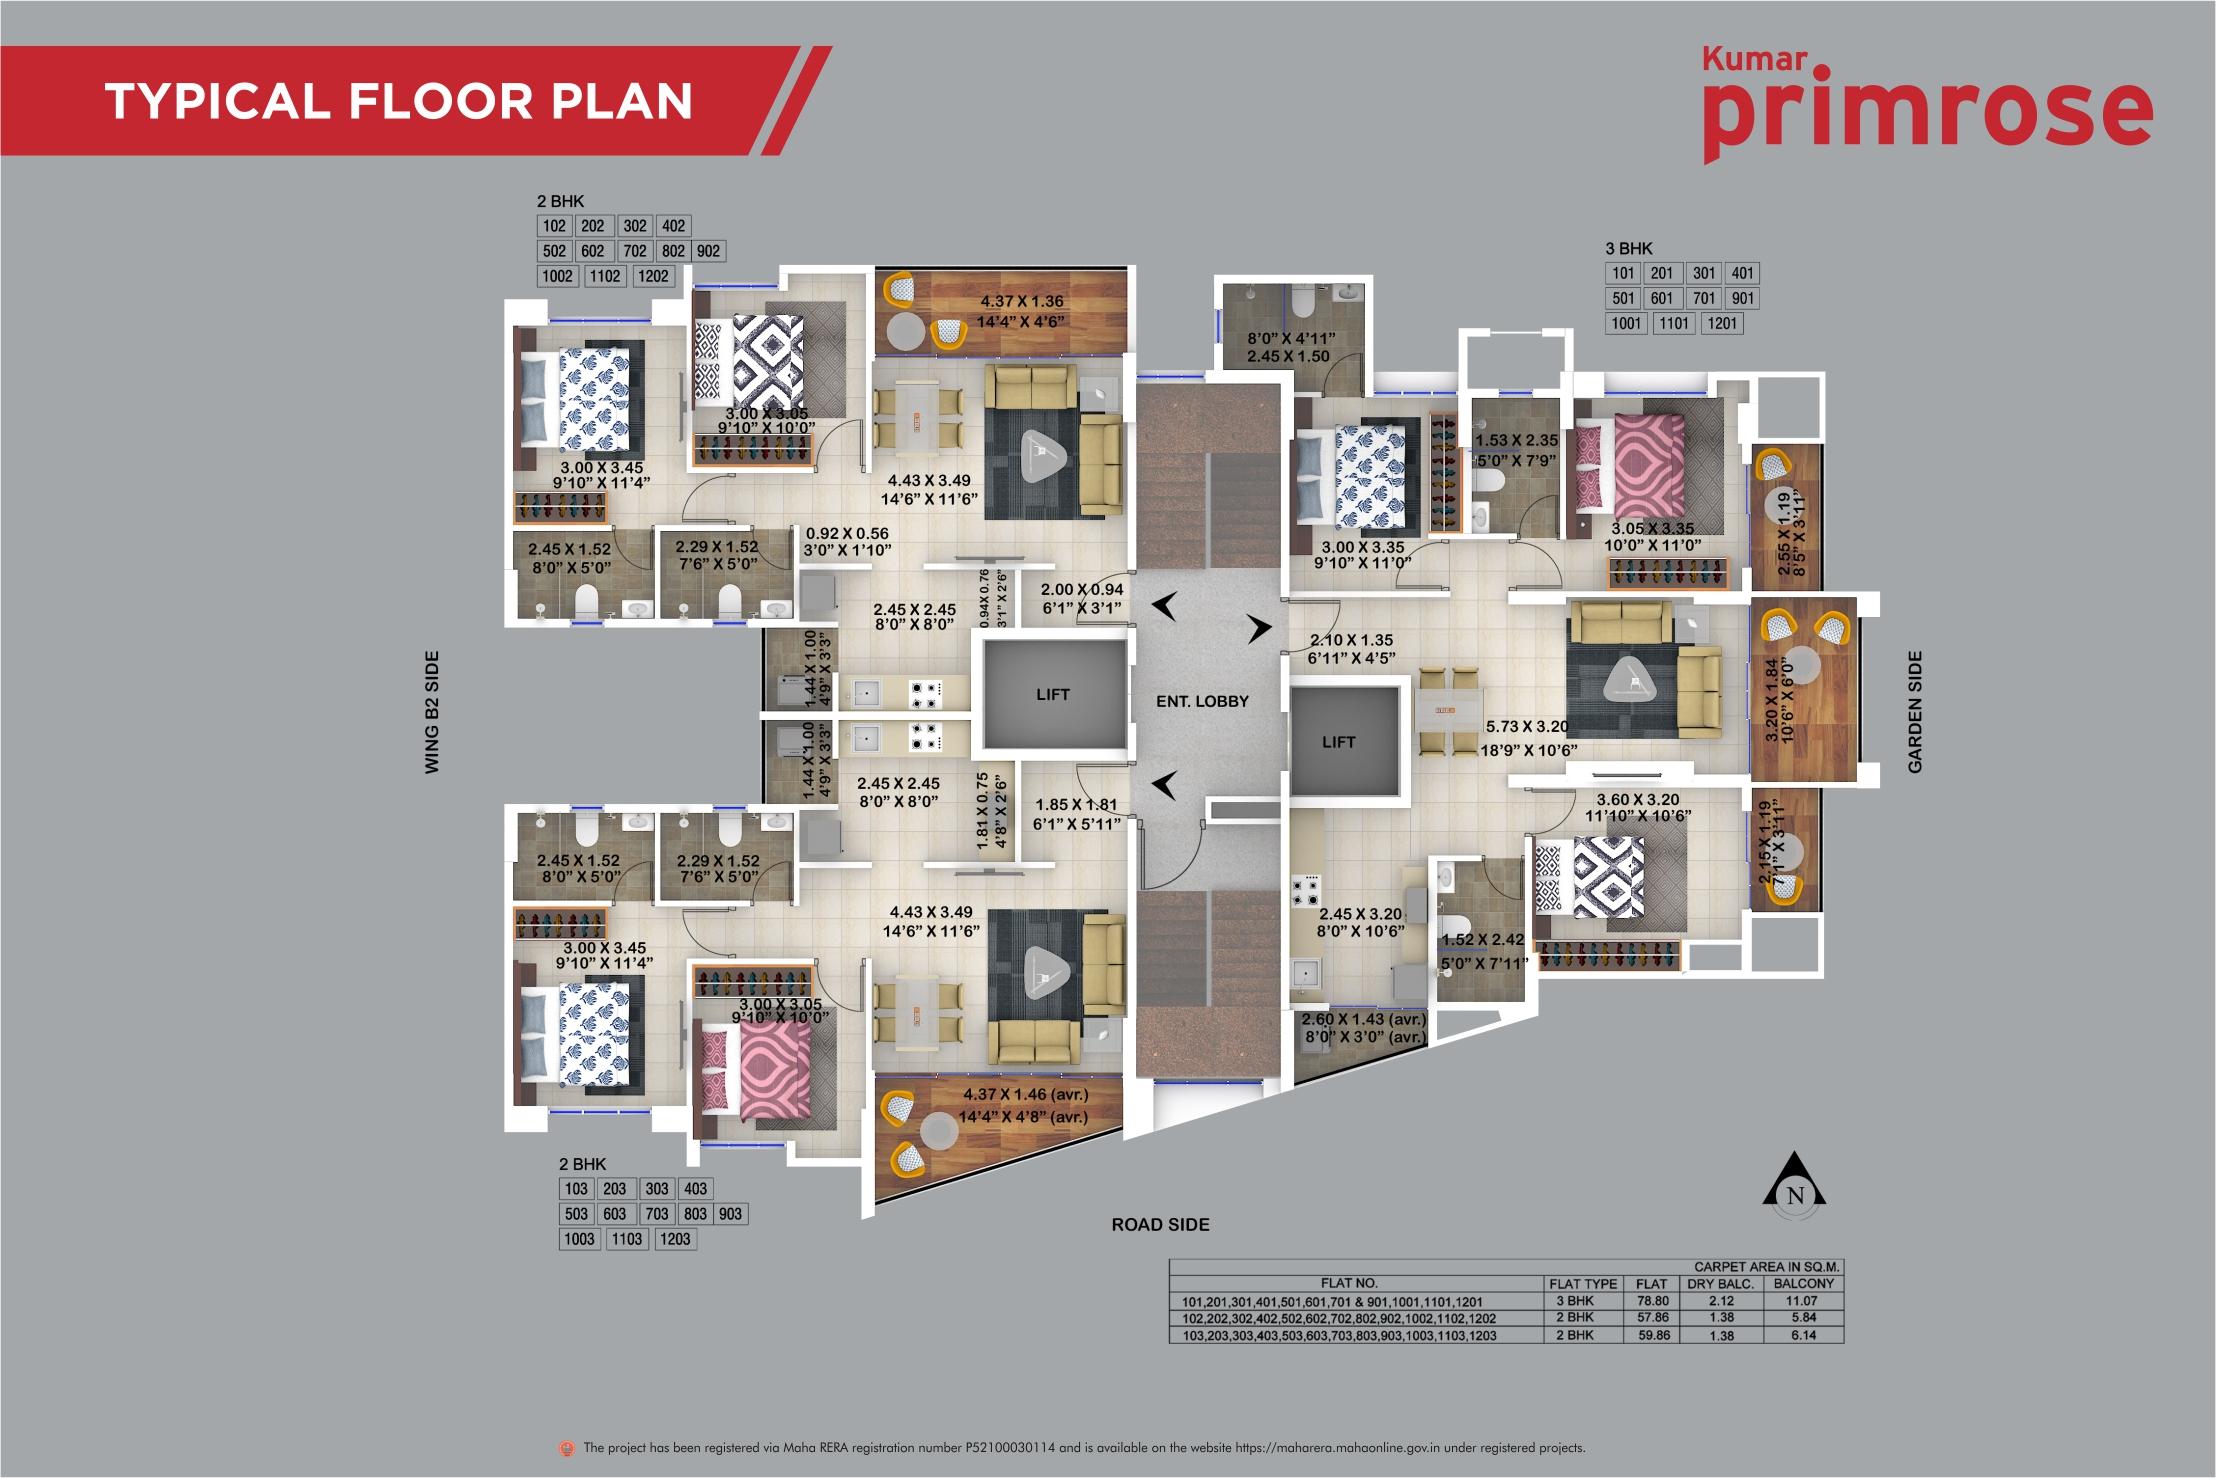 Revised primrose typical floor plan with rera no. 3